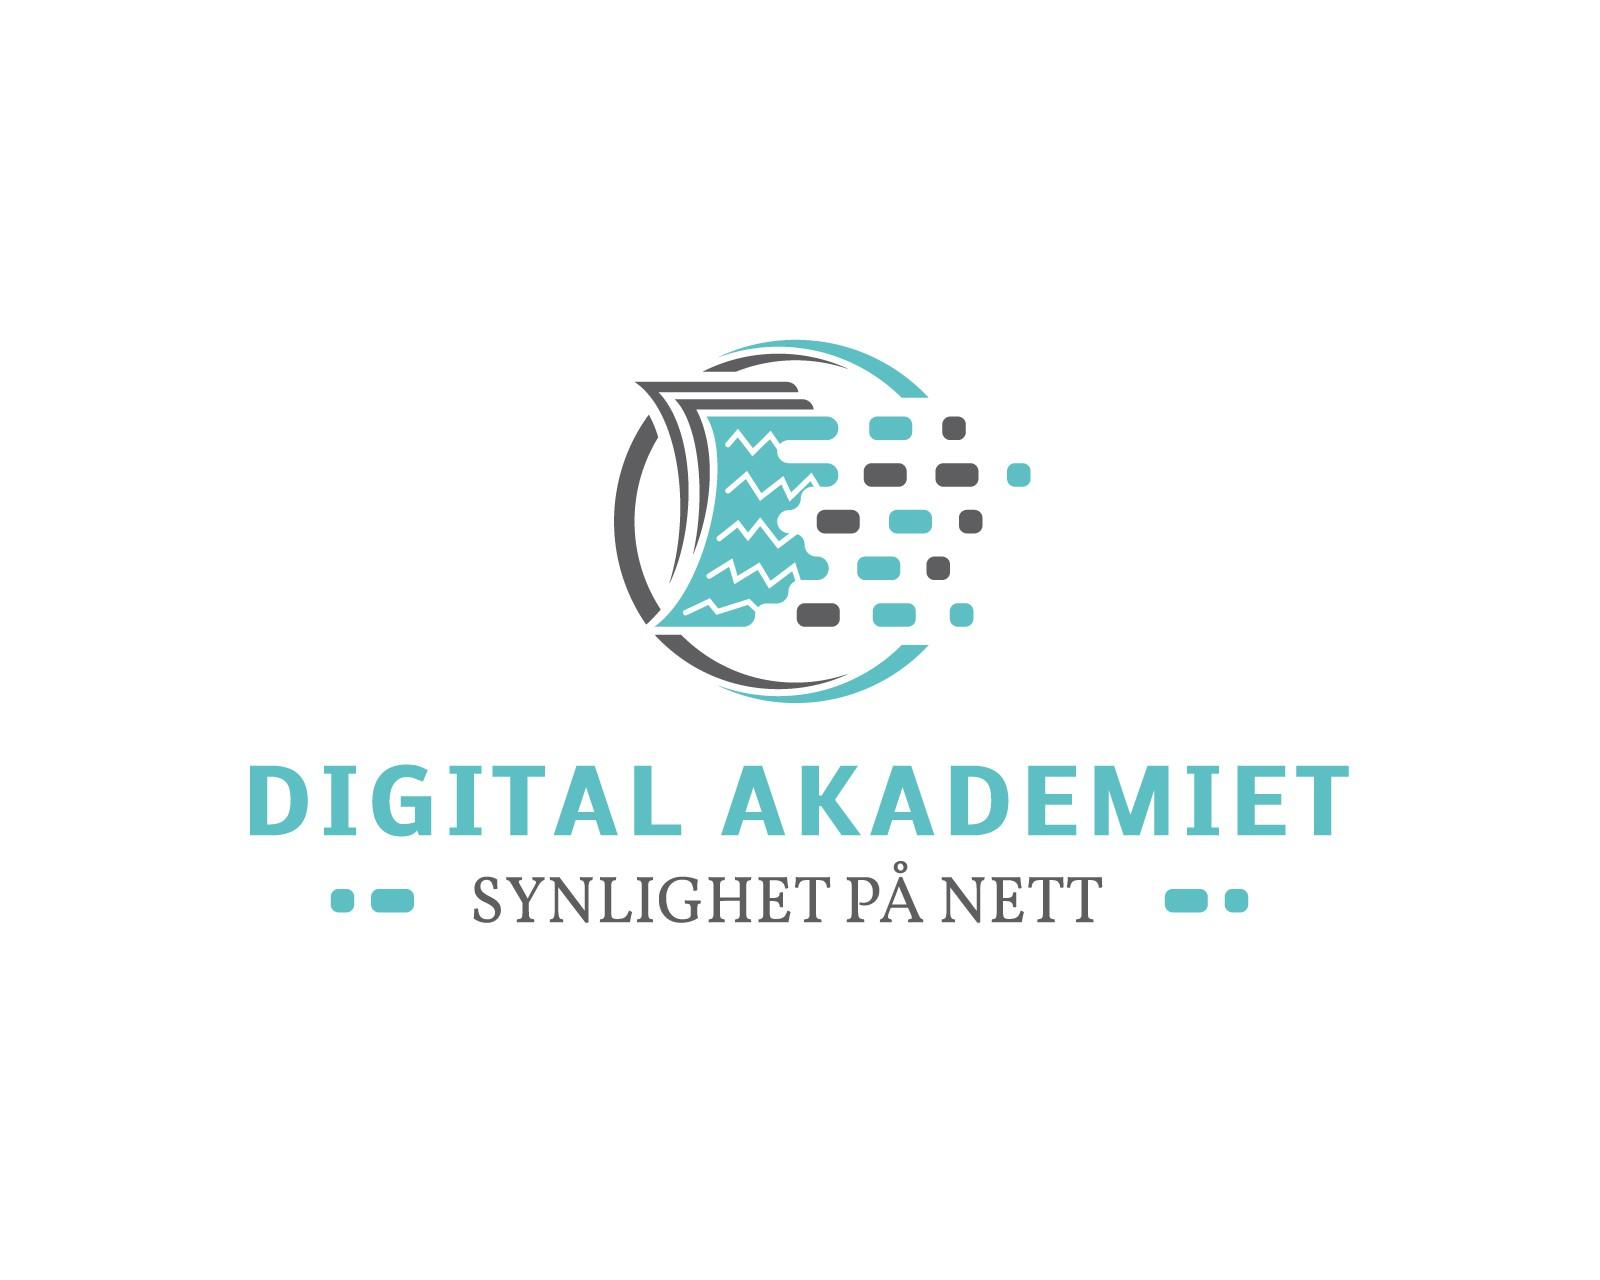 Digital Akademiet